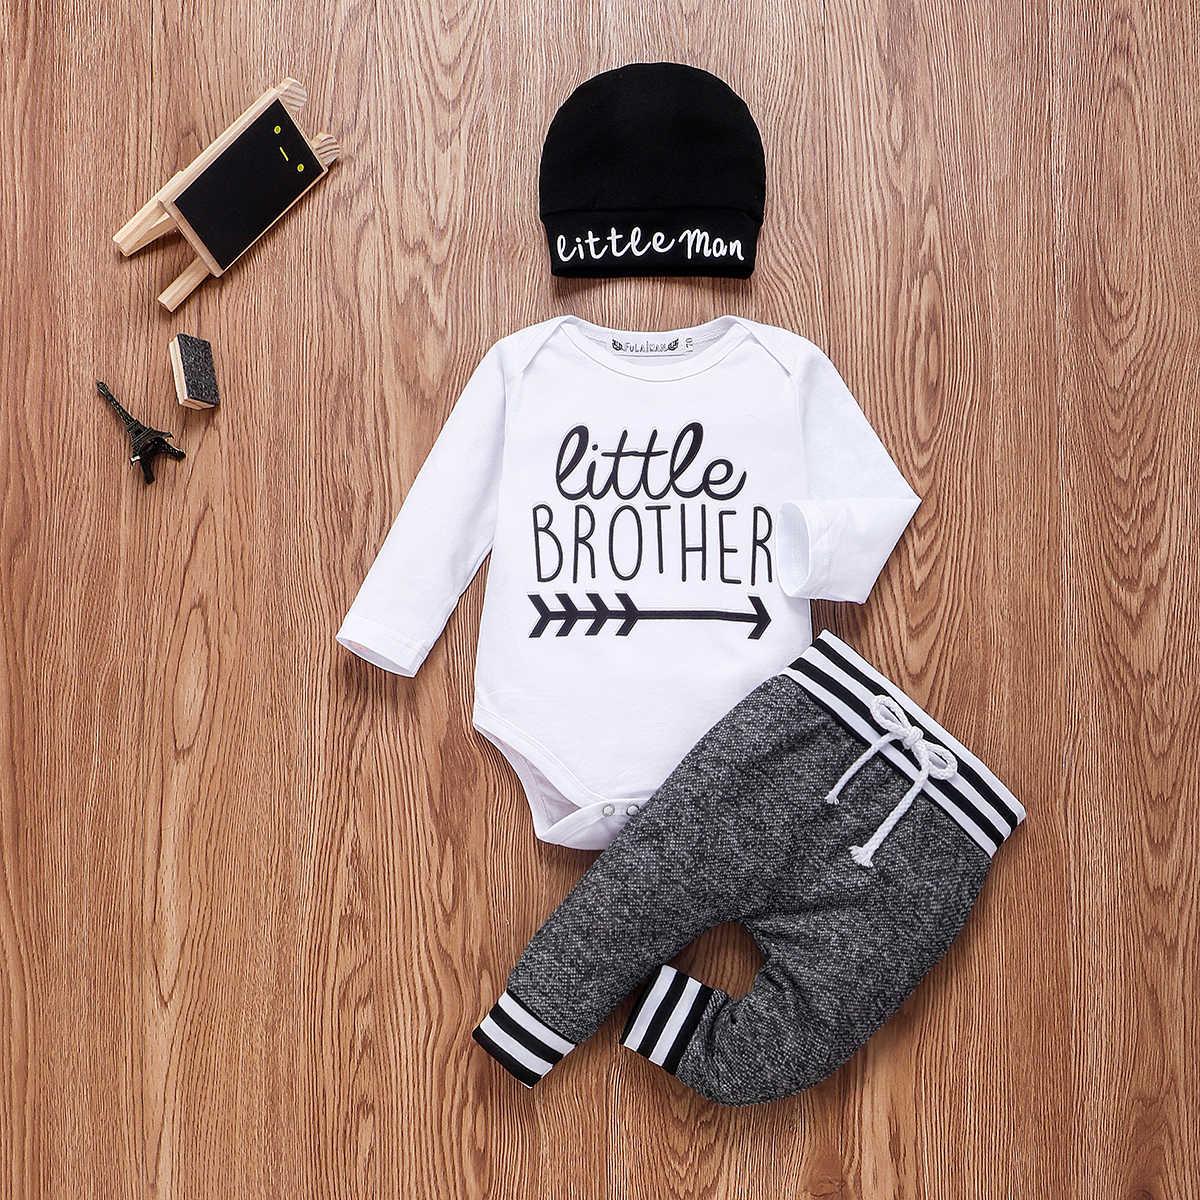 Bayi Baru Lahir Bayi Laki-laki Pakaian Set 3 Pcs Adik Lengan Panjang Baju Monyet Celana Topi Pakaian Pakaian